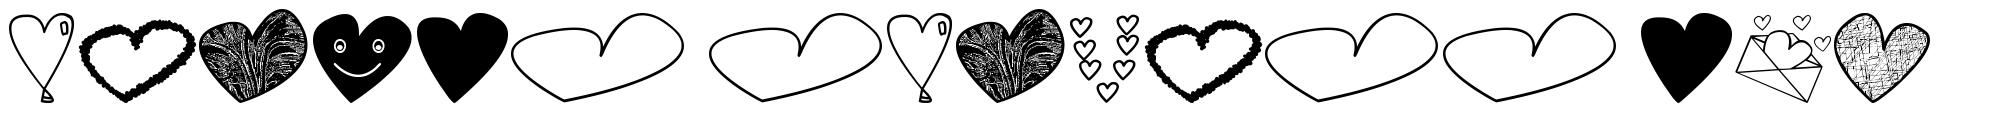 Hearts Shapess TFB フォント